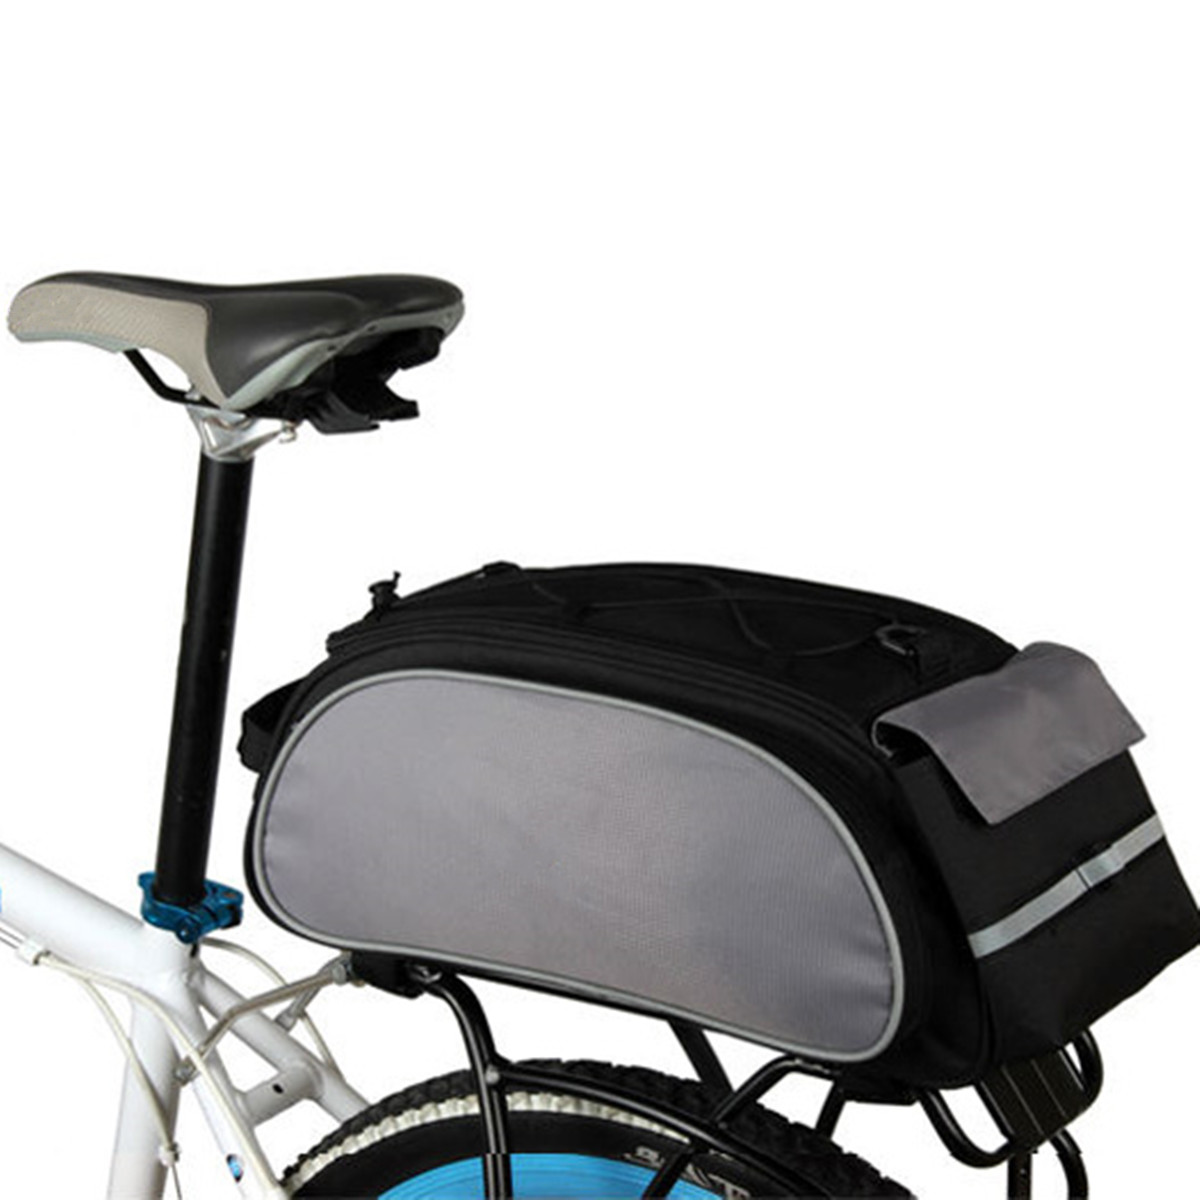 MTB Bike Rear Shelf Tail Package Bicycle Storage Bag Cycling Back Seat Pannier